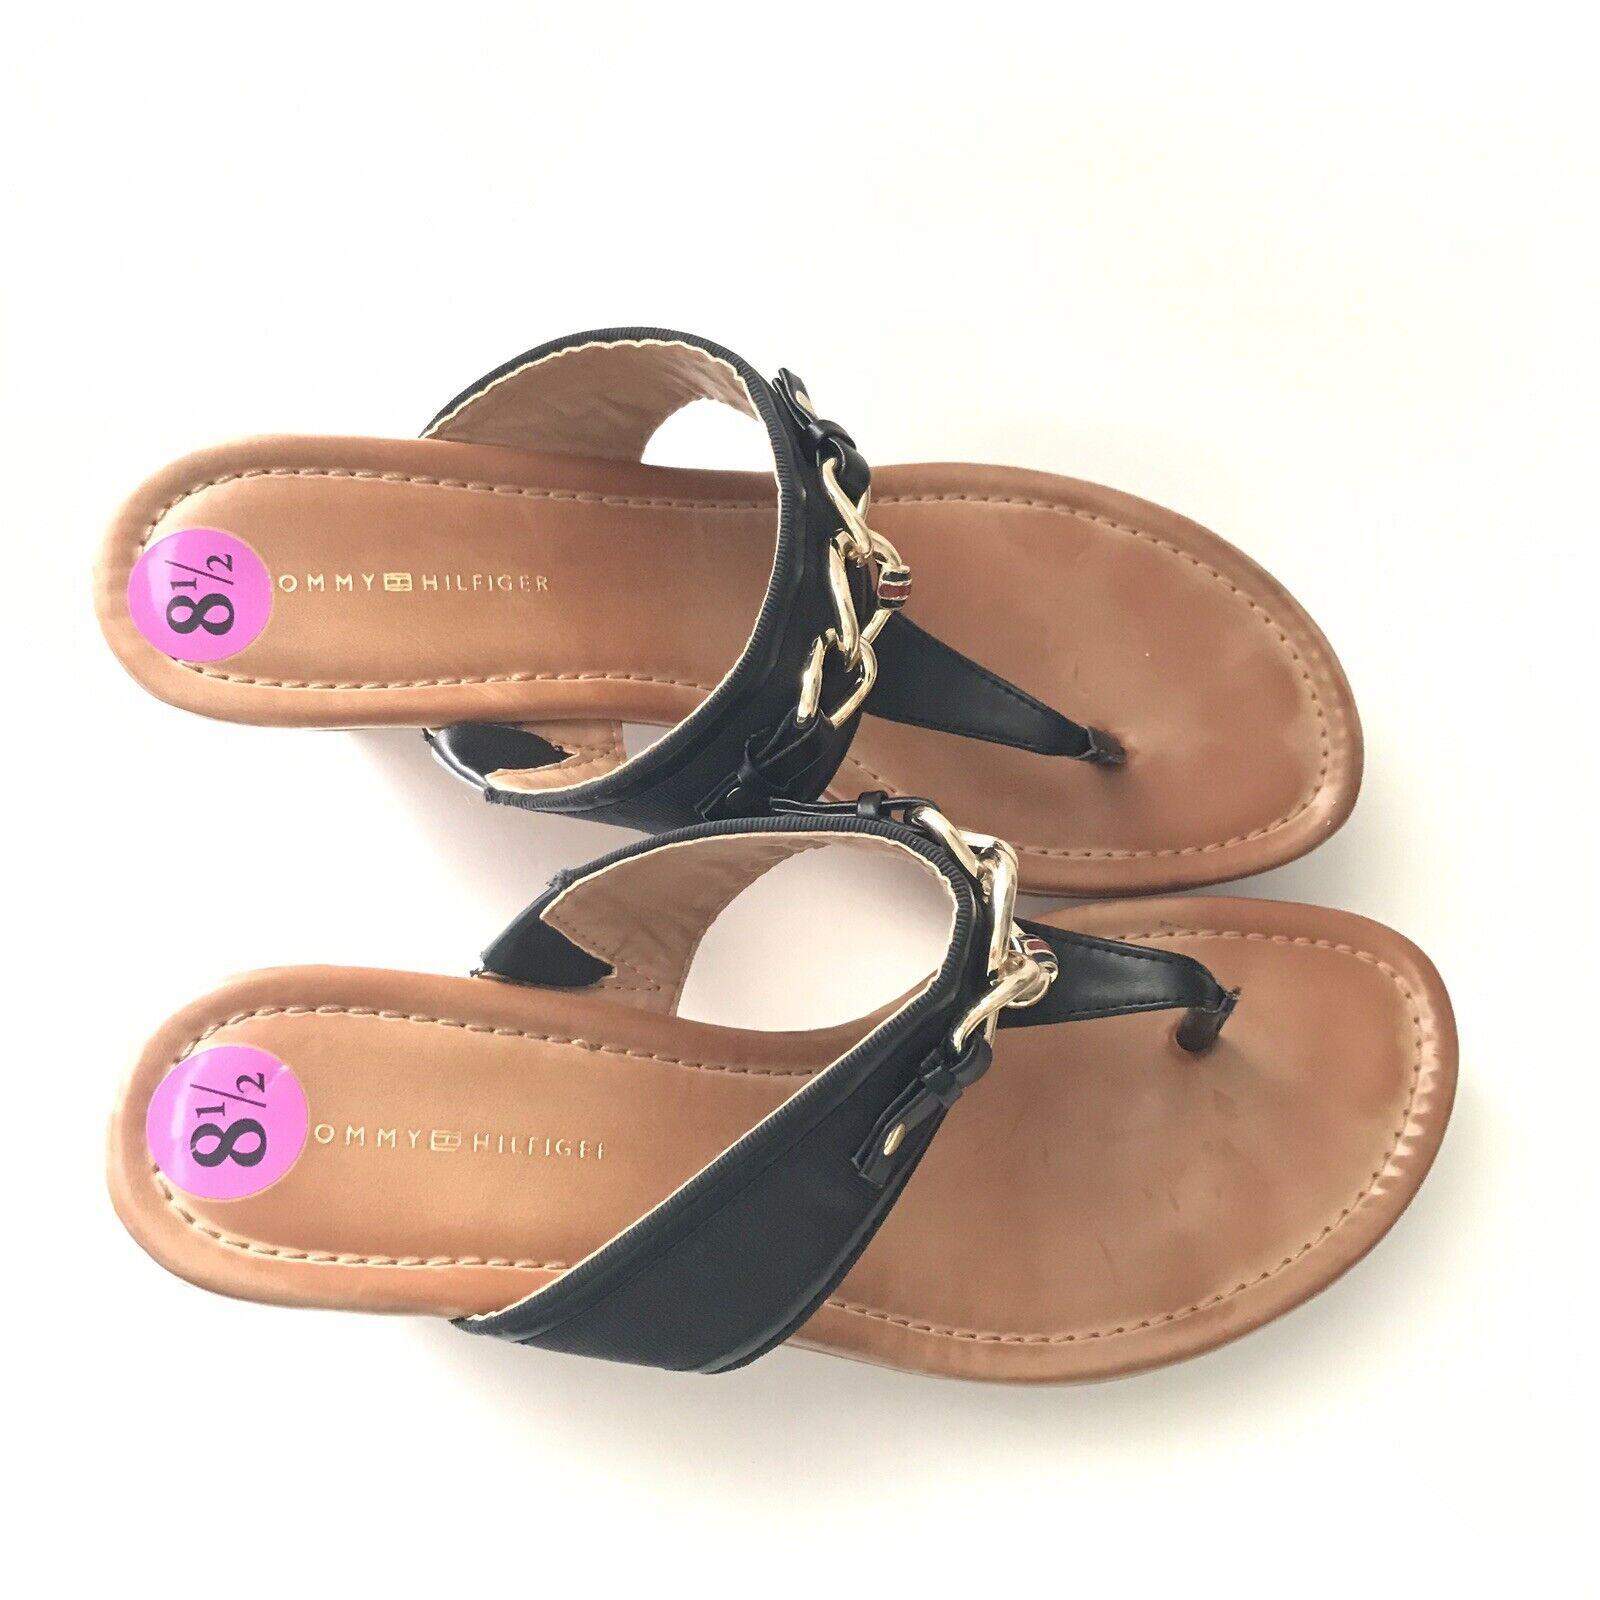 tommy hilfiger Womens Sandal Size 8.5M Melane Tho… - image 3